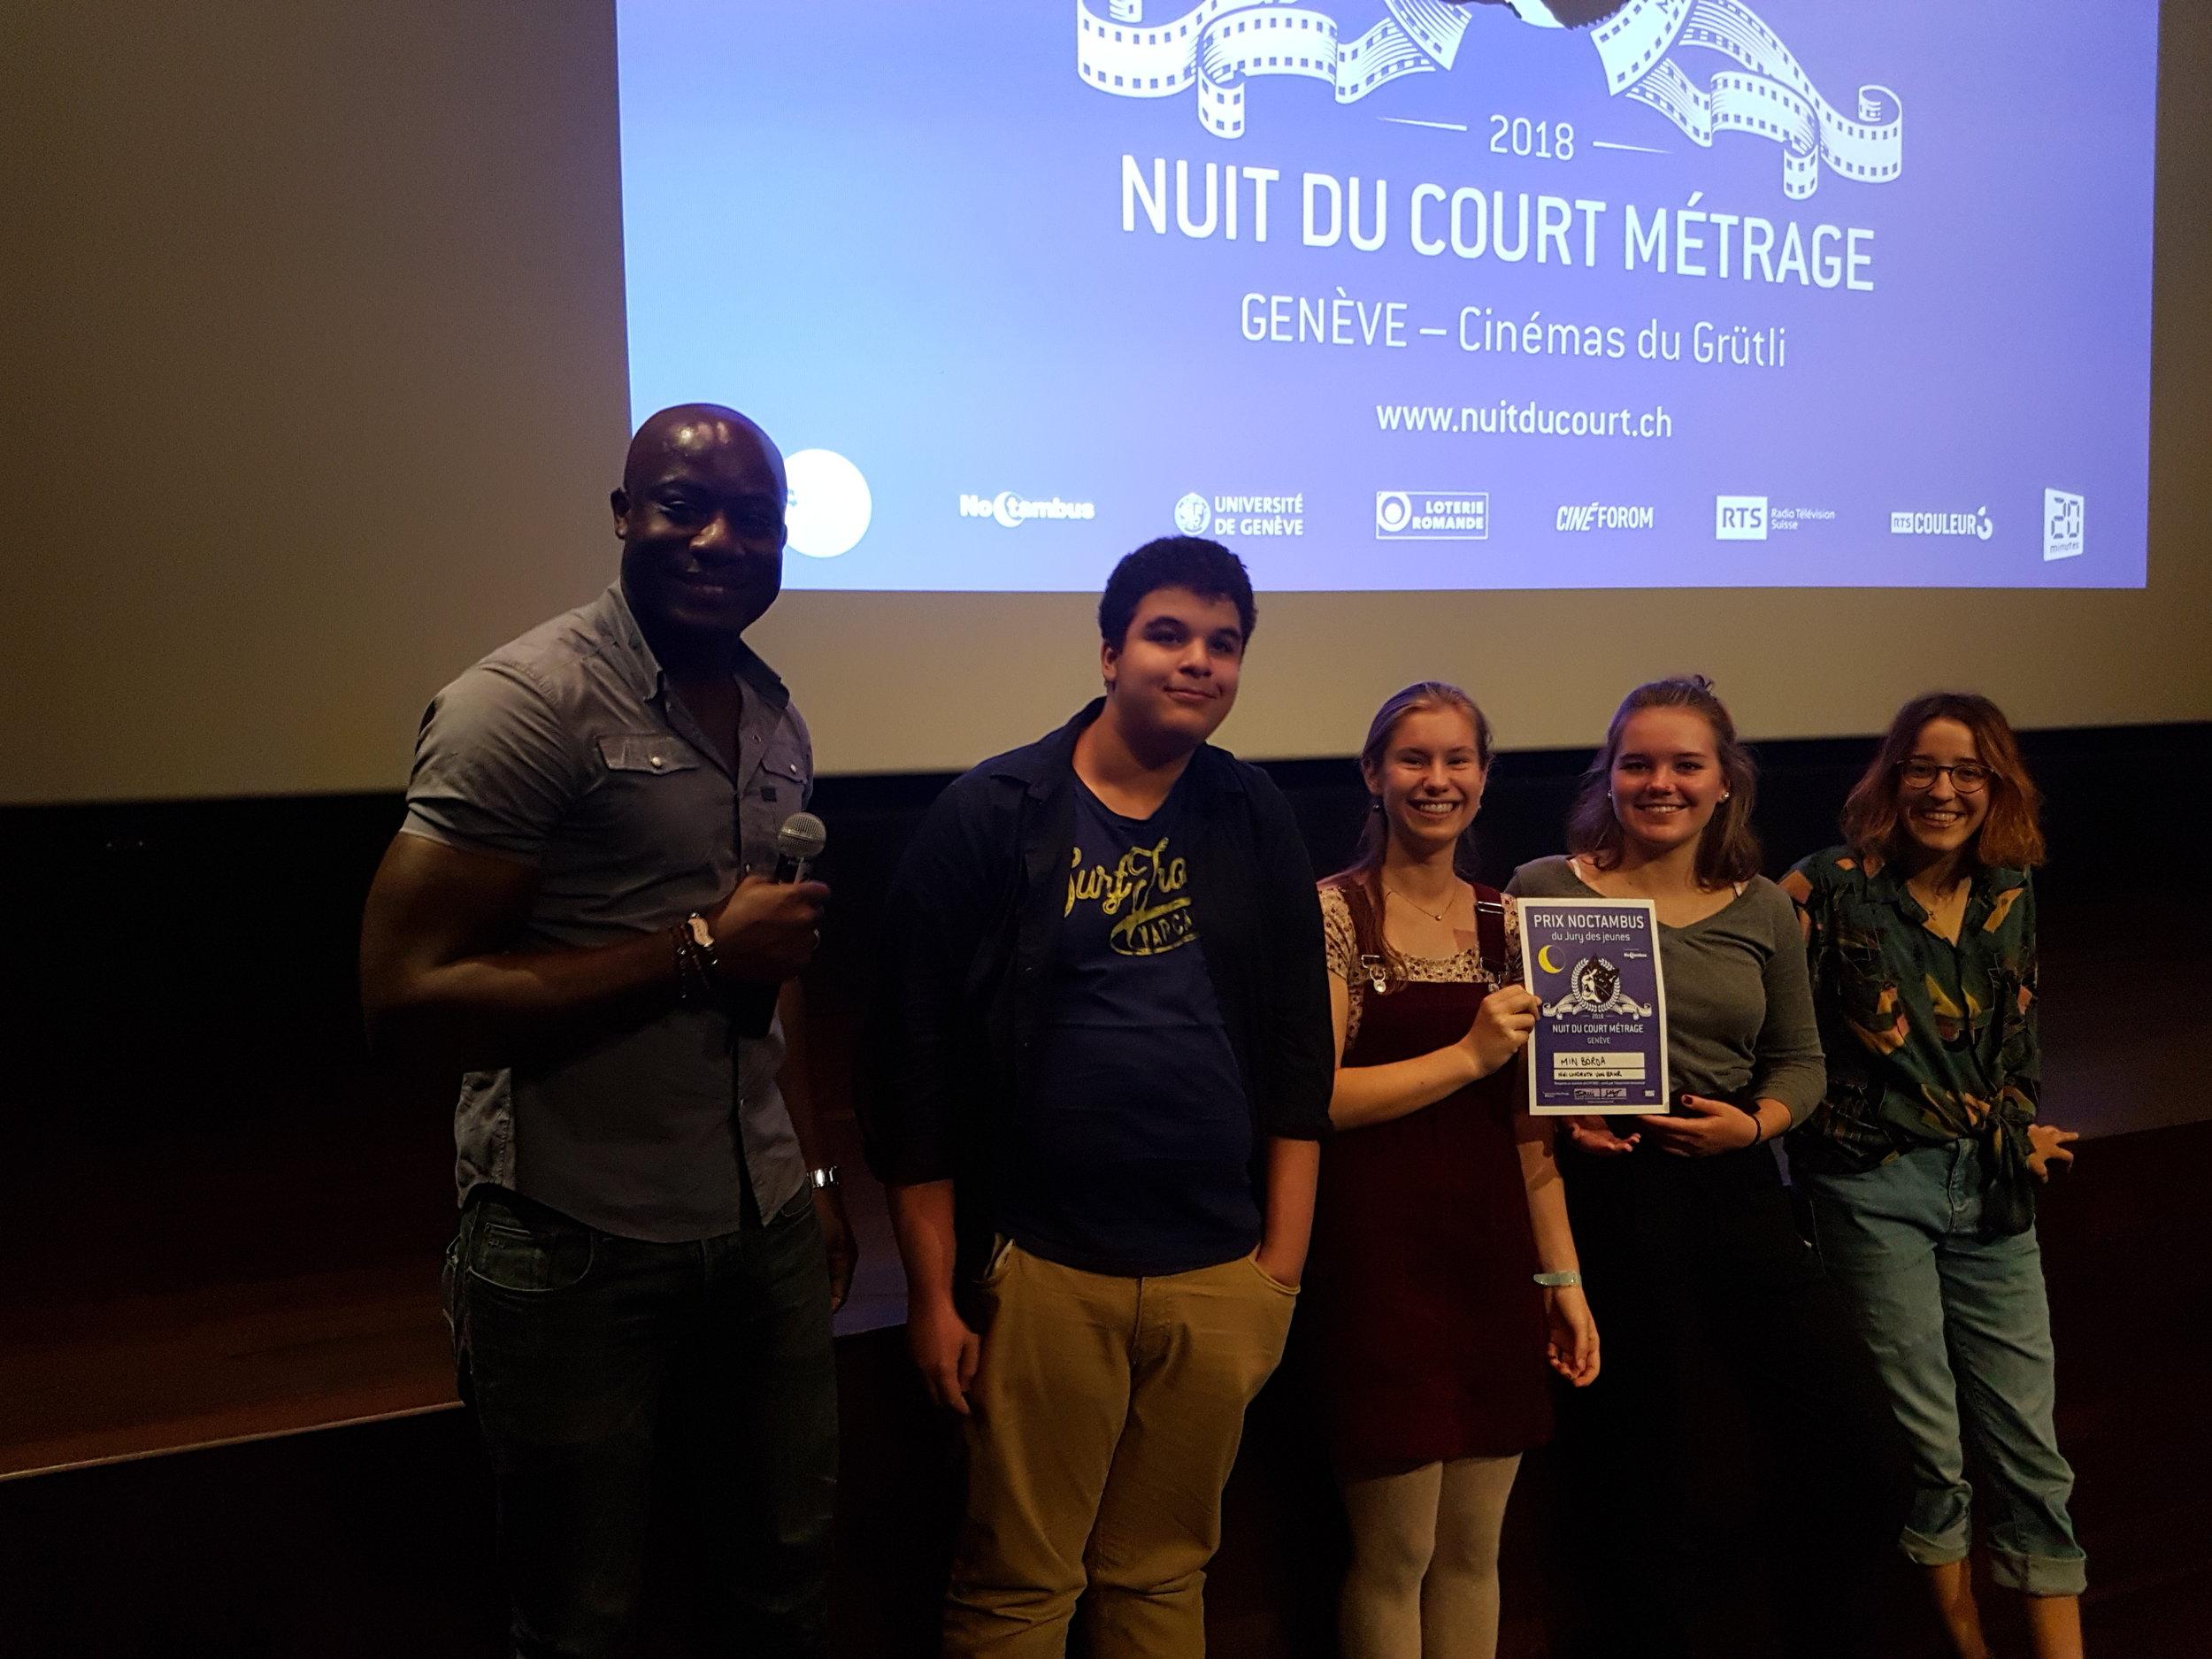 NDC18_2018-09-21_Geneve_Jury-des-jeunes_17.jpg